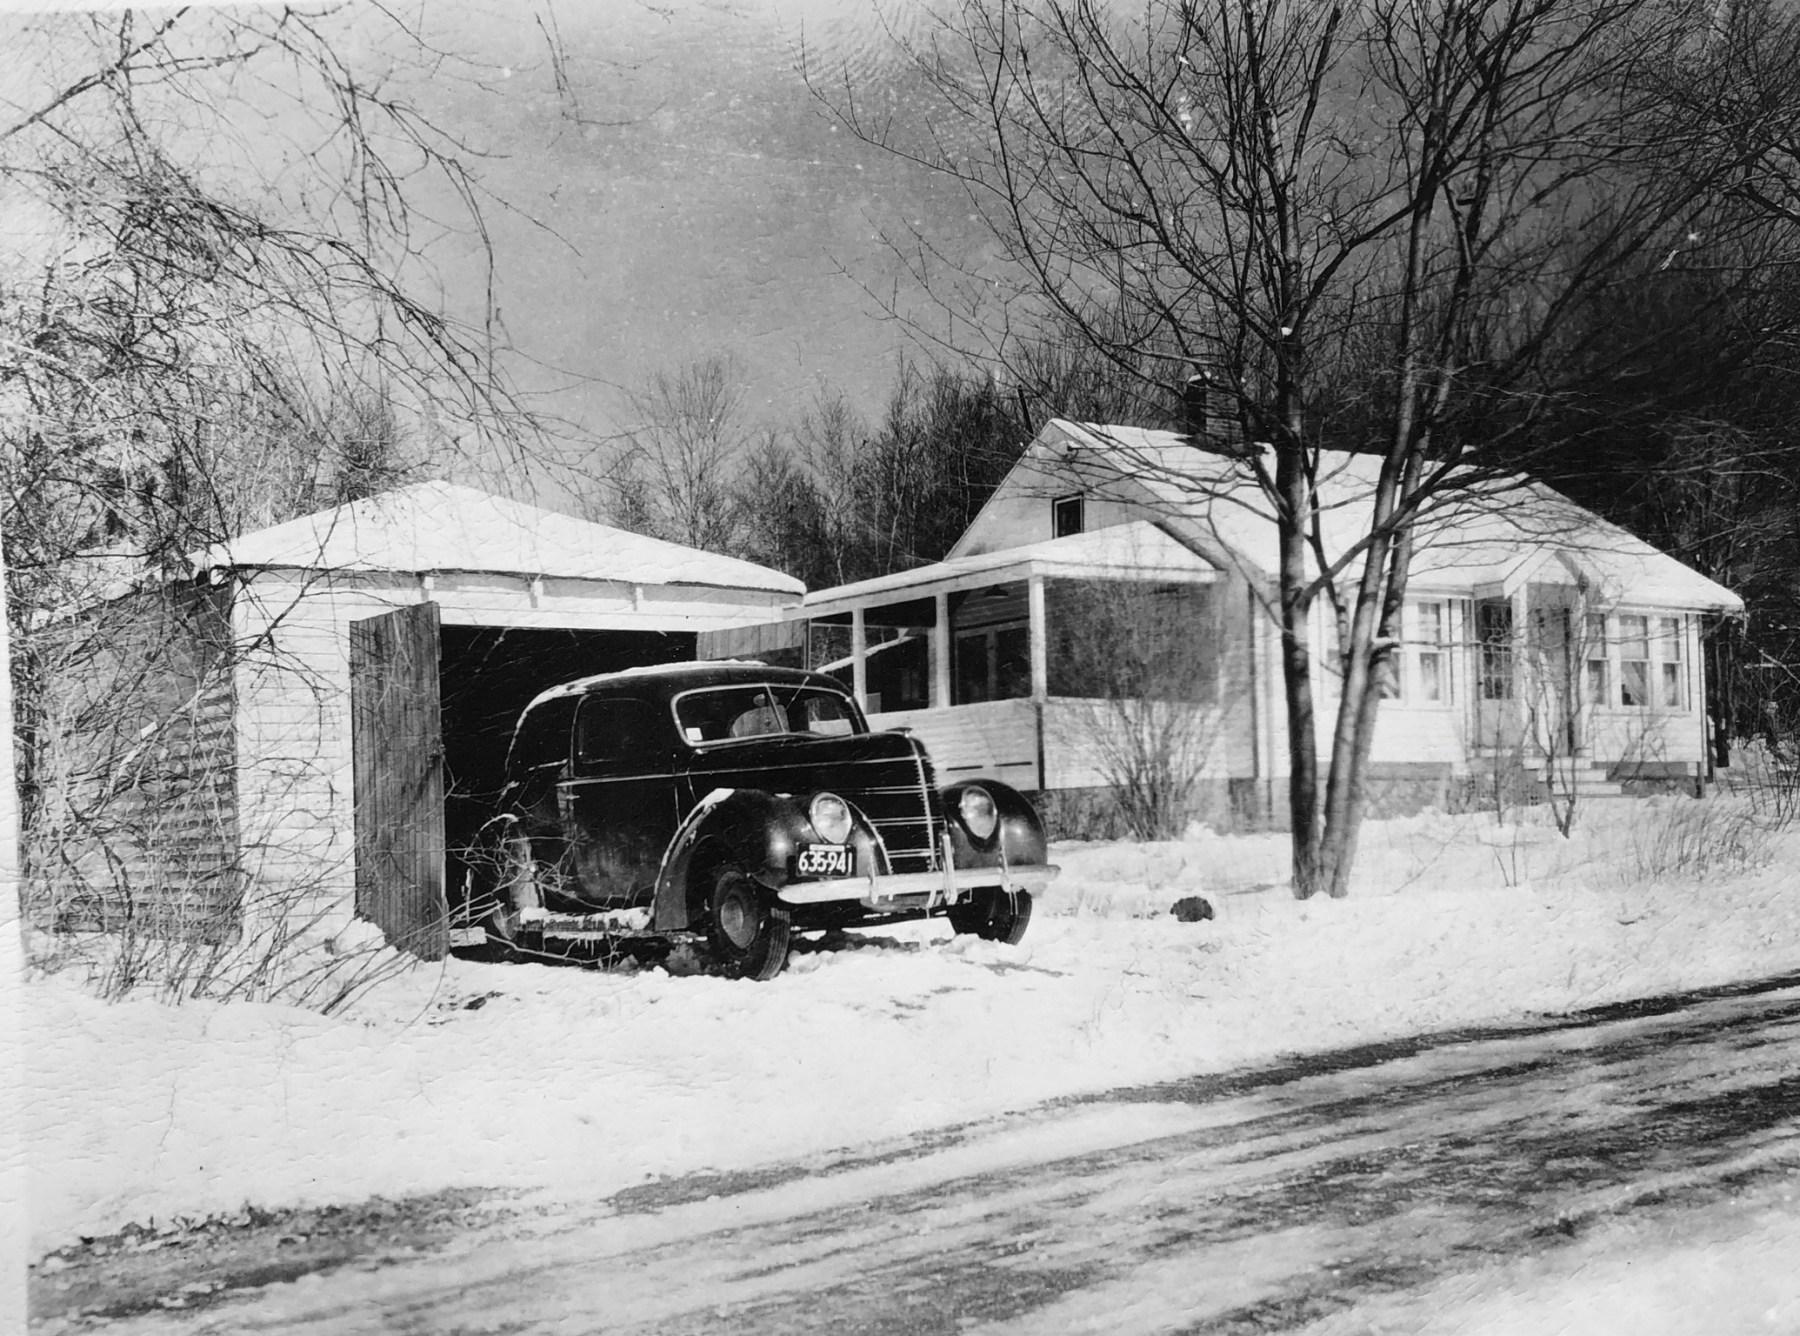 Wayne's house and car, Burlington MA